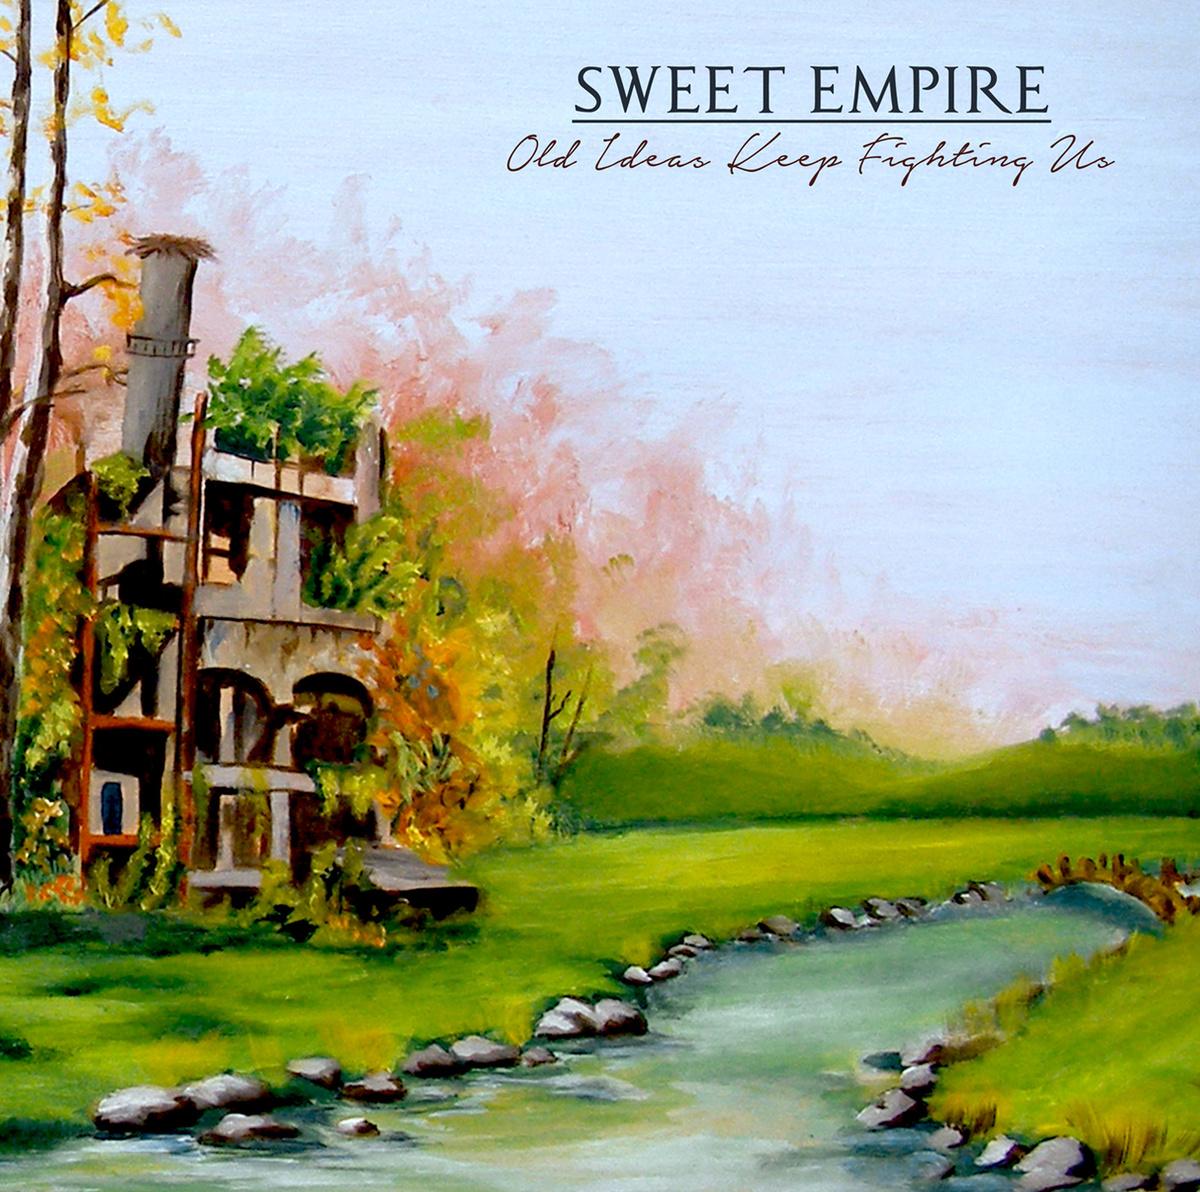 Sweet Empire announces second album, release video.